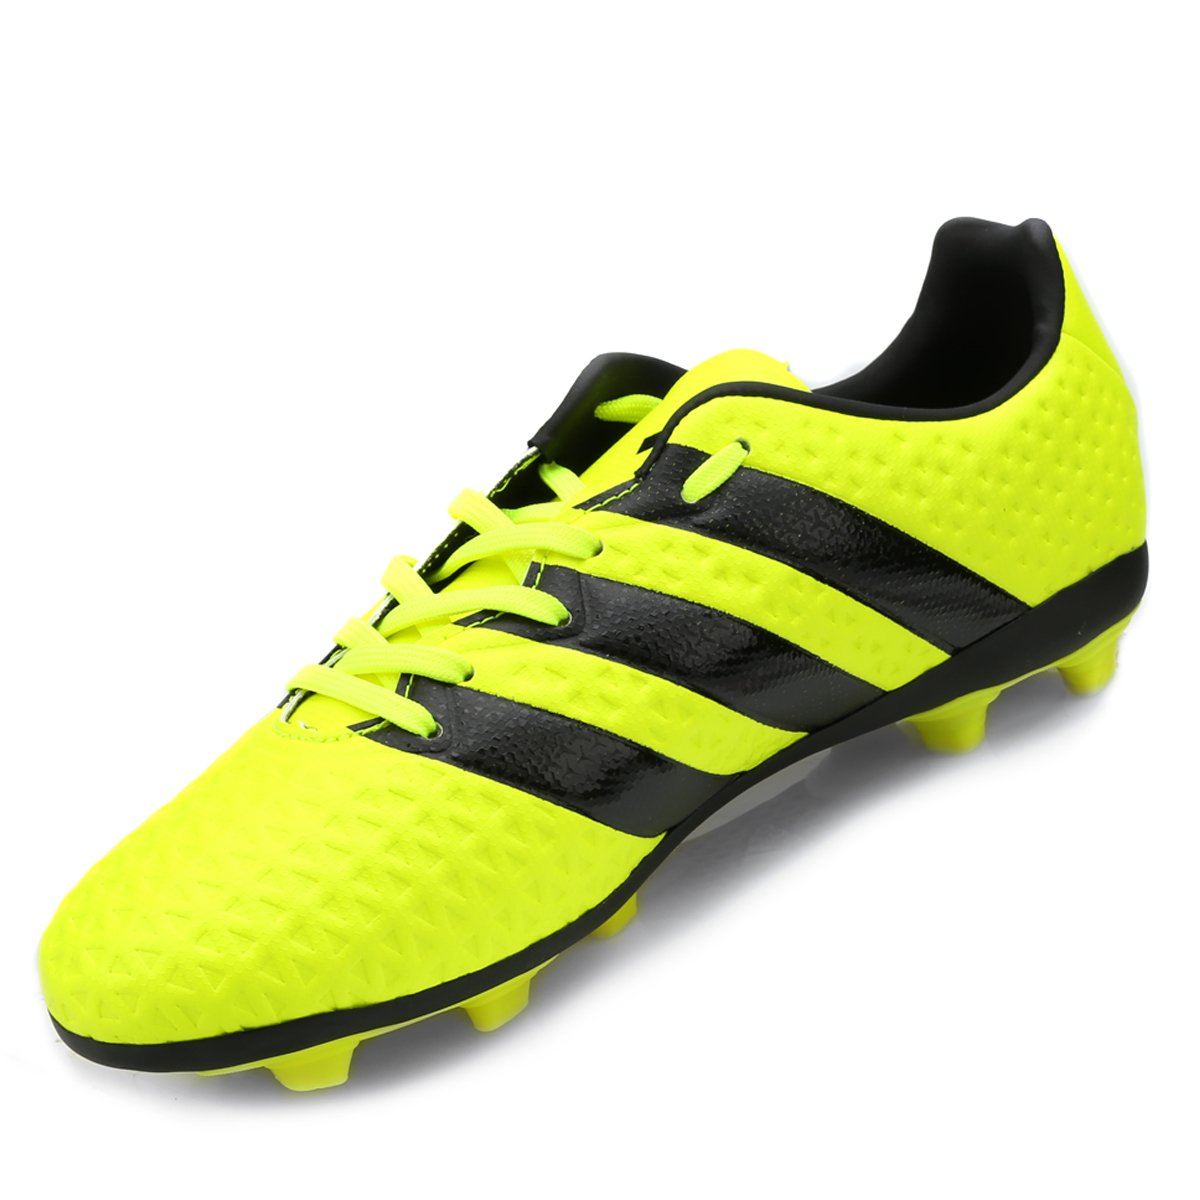 4ab3d8e867 Chuteira Adidas Ace 16.4 FXG Campo Juvenil - Compre Agora